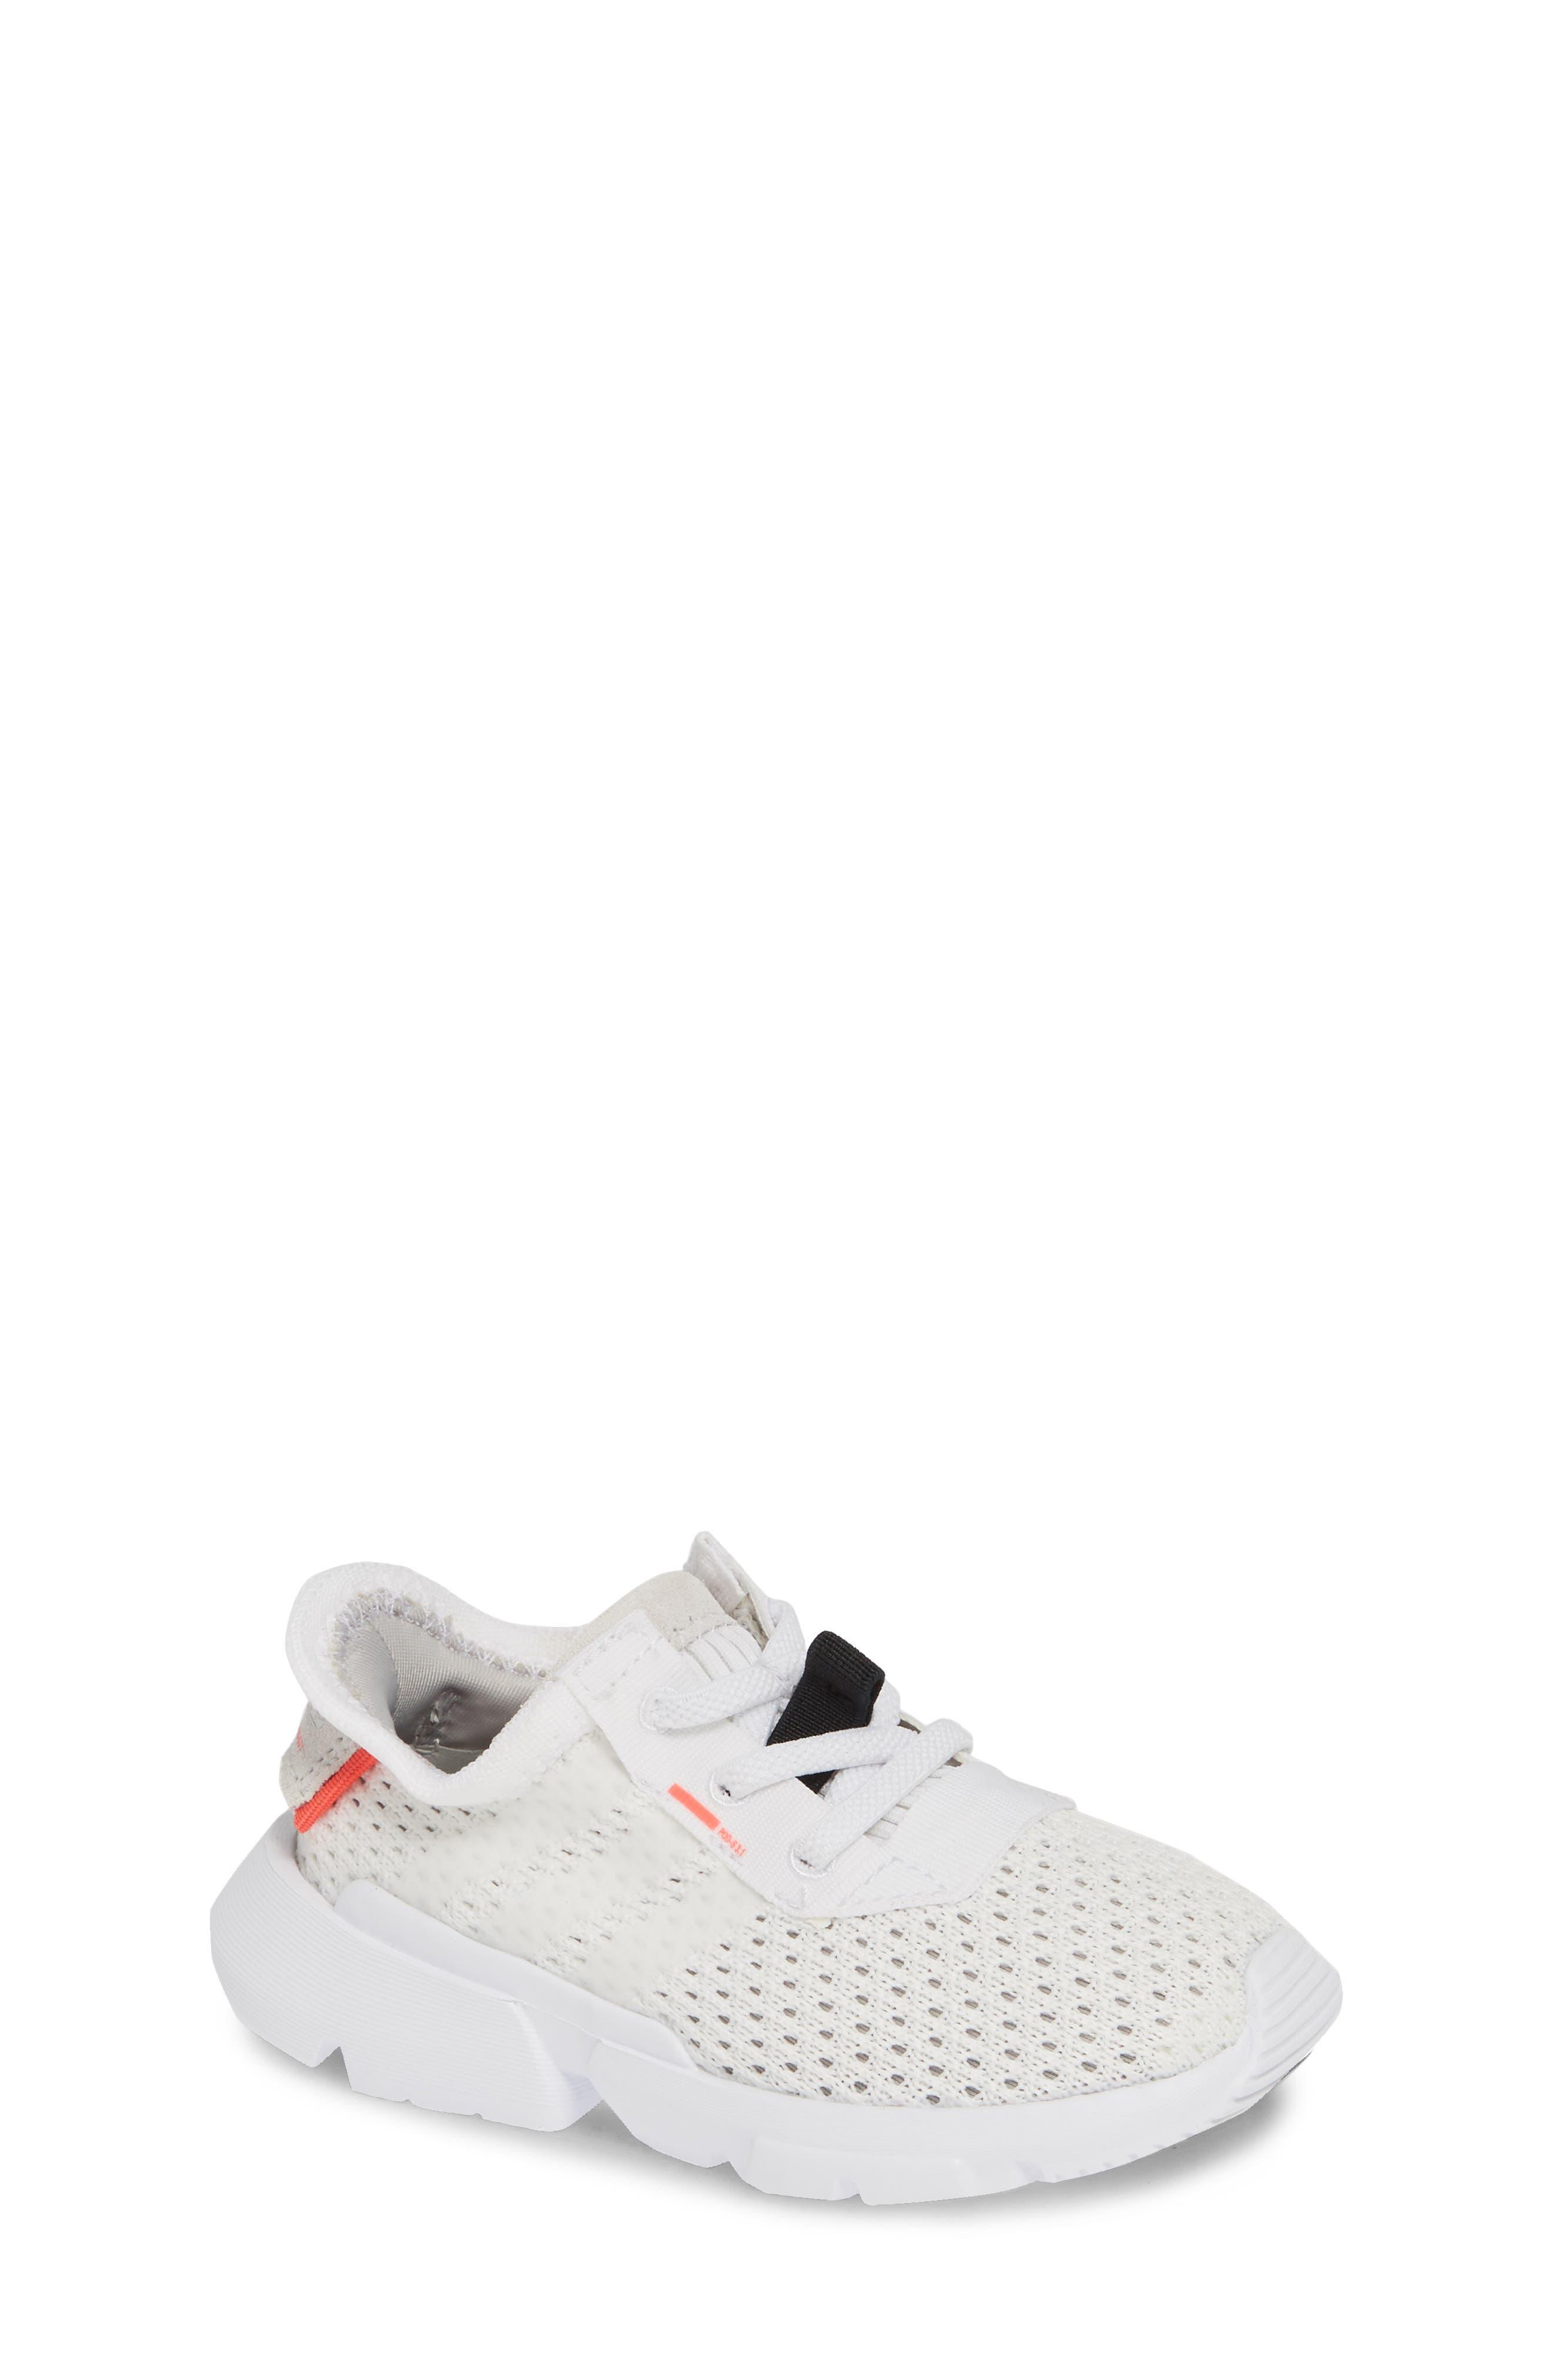 ADIDAS POD-S3.1 Sneaker, Main, color, WHITE/ WHITE/ SHOCK RED